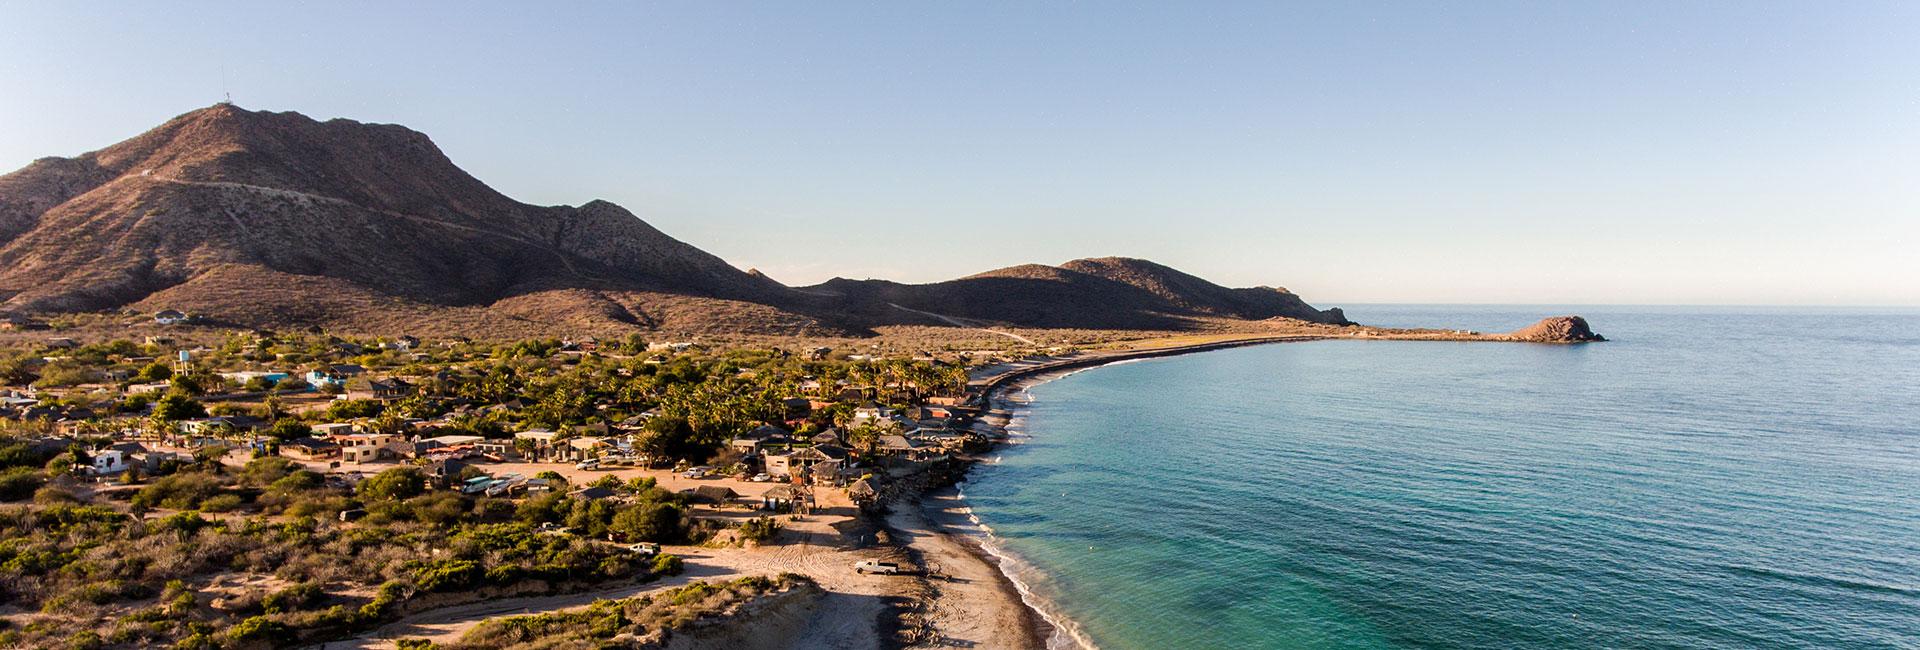 Cabo pulmo national marine park